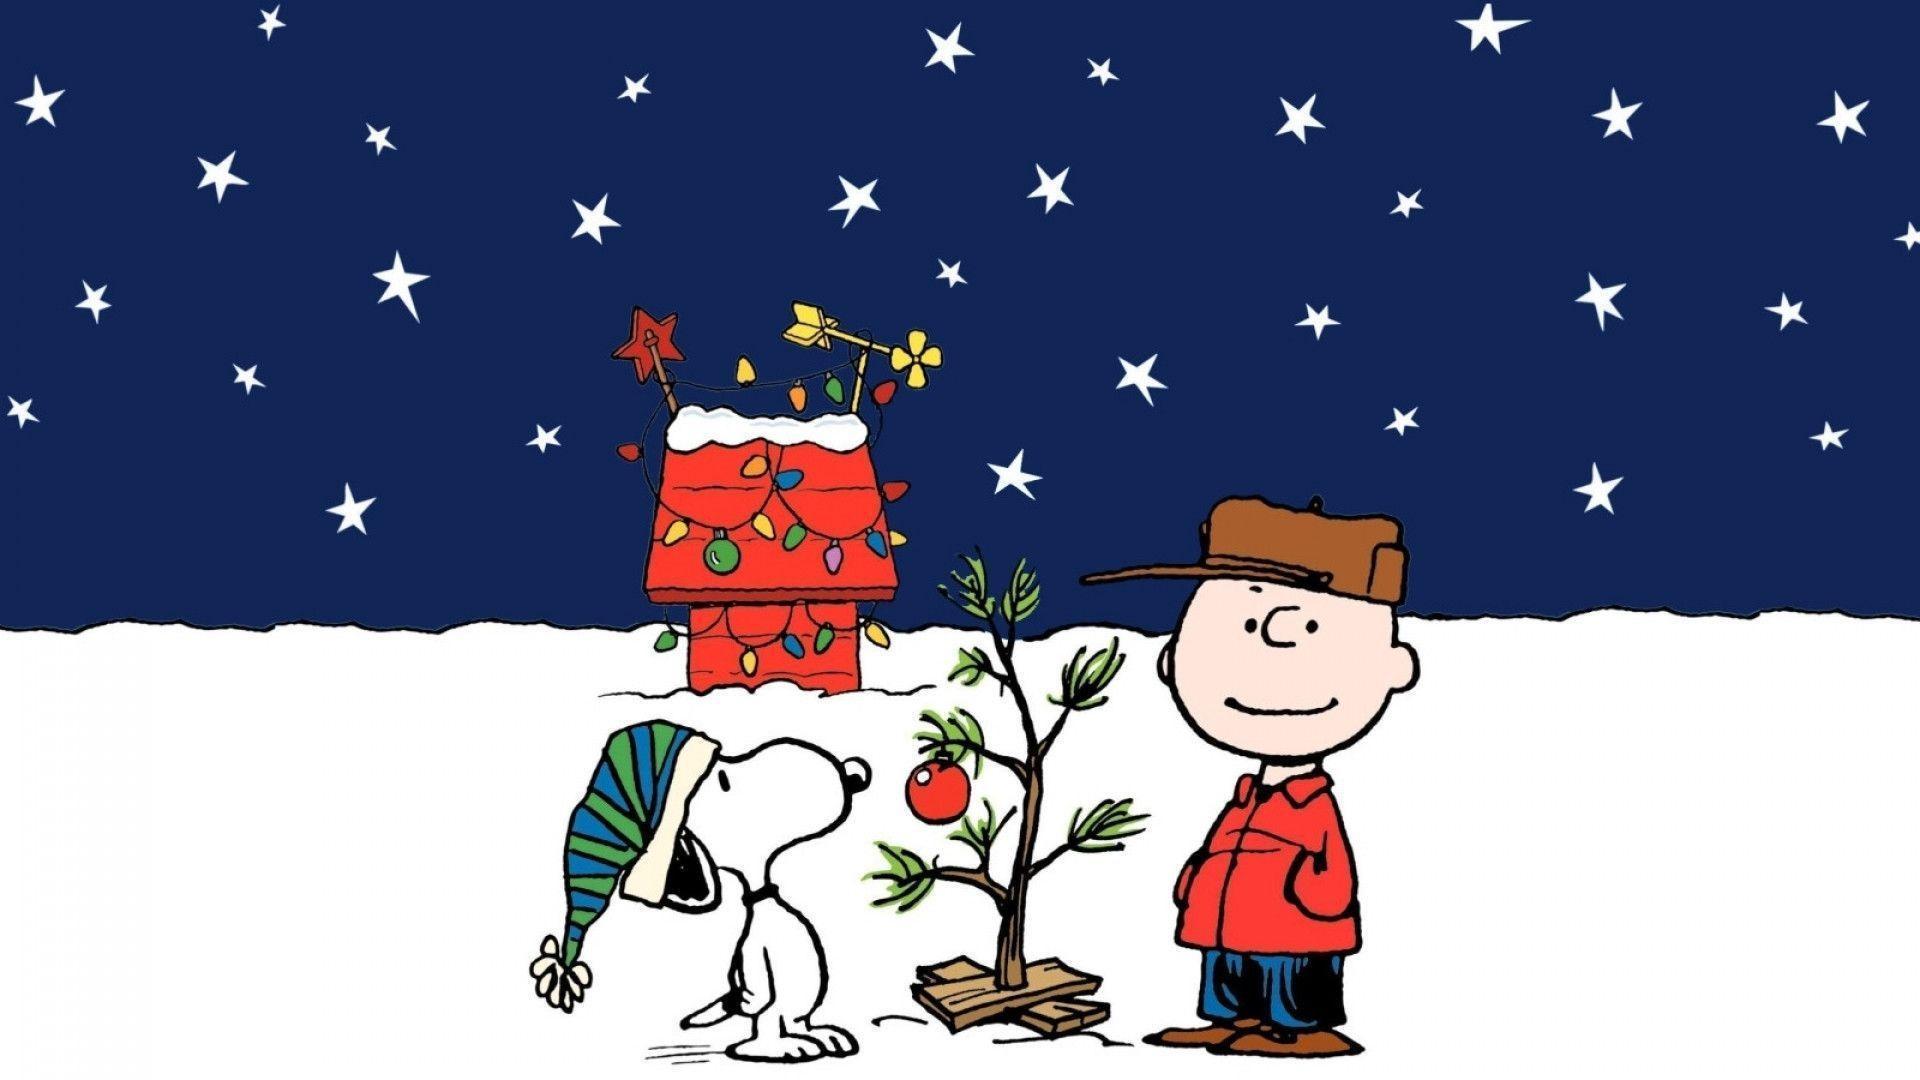 Latest Snoopy Christmas Wallpaper Design